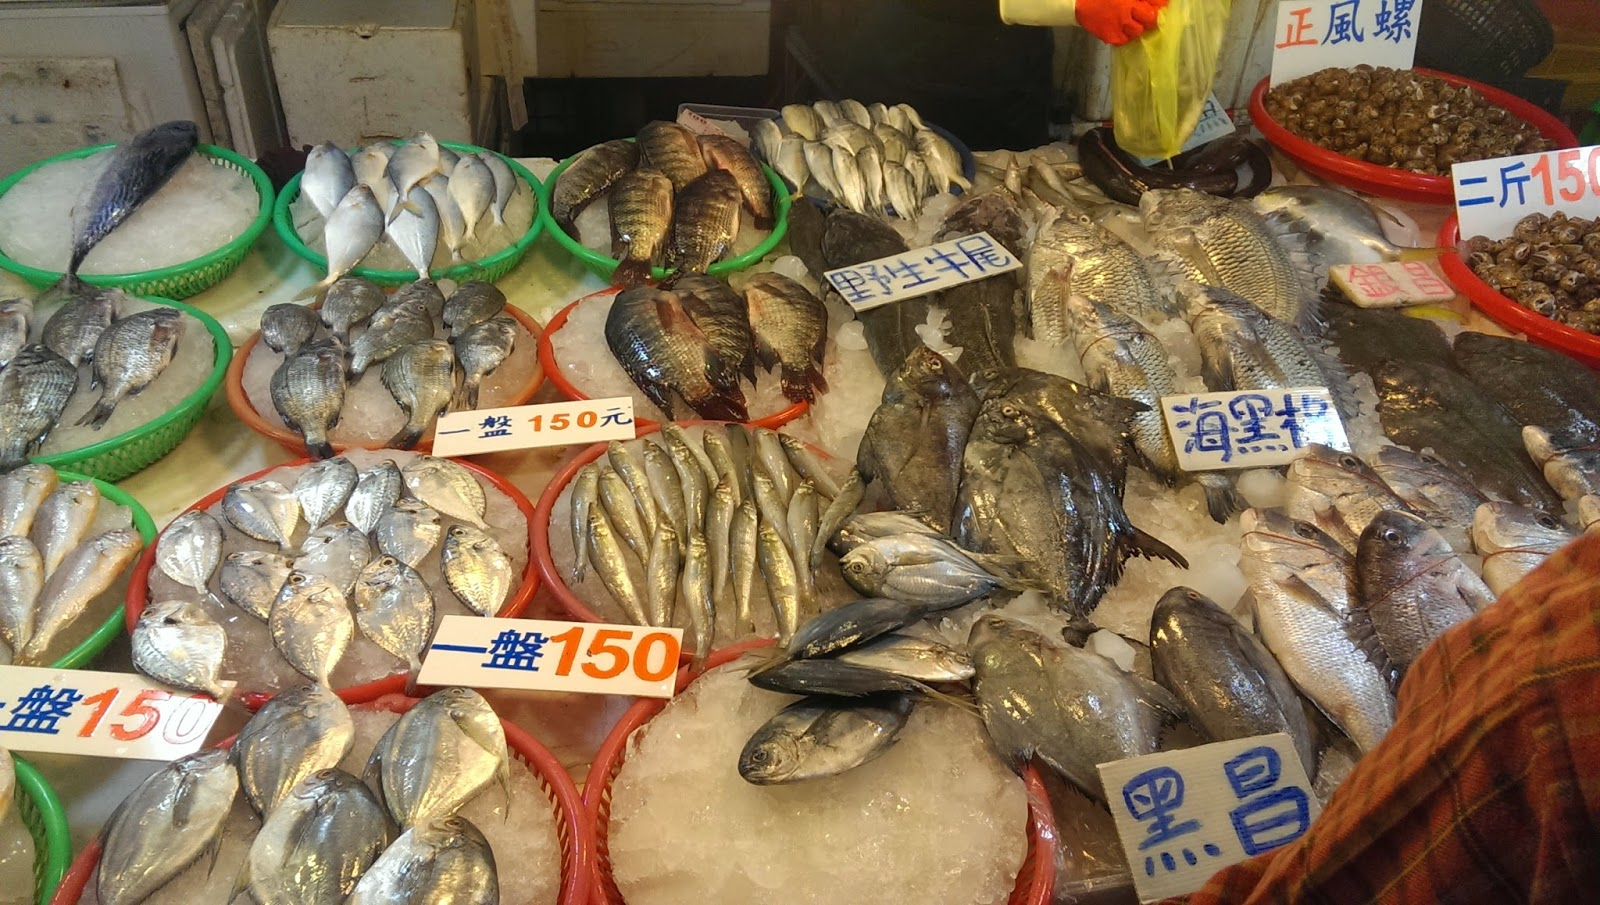 2015 02 02%2B12.59.13 - [食記] 葉家生魚片 - 布袋觀光漁市中的鮮魚餐廳